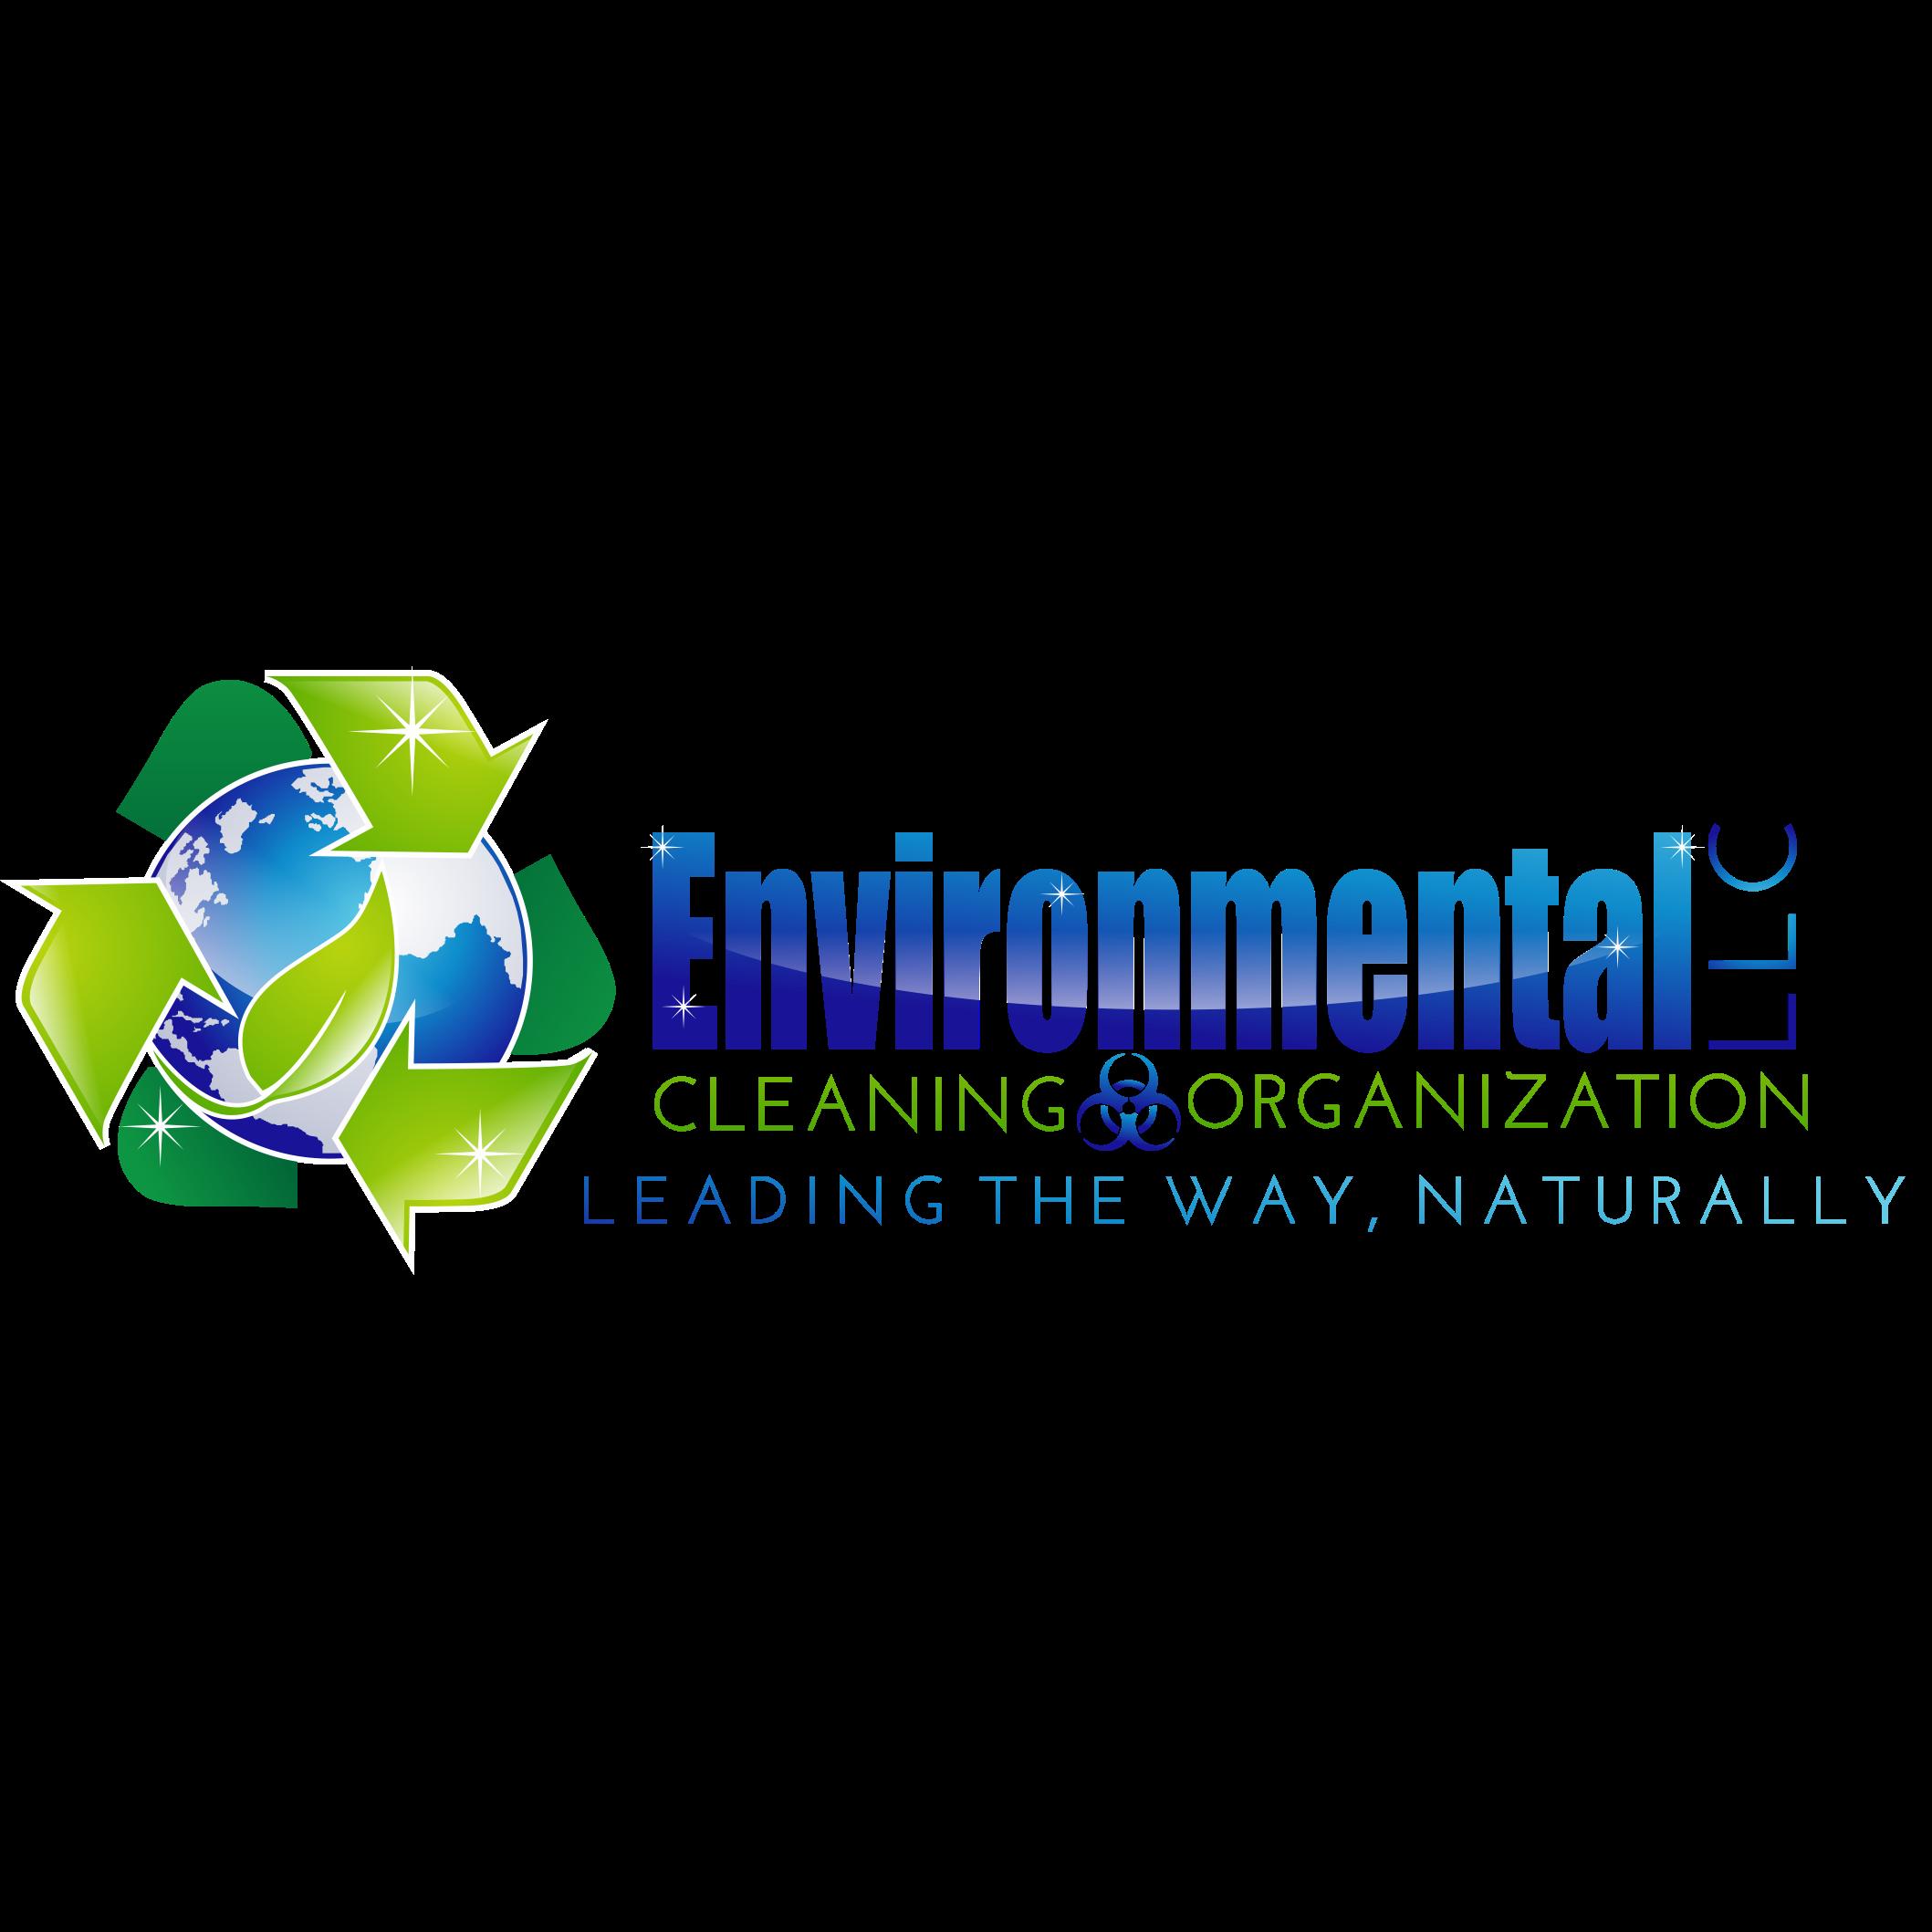 Environmental Cleaning Organization